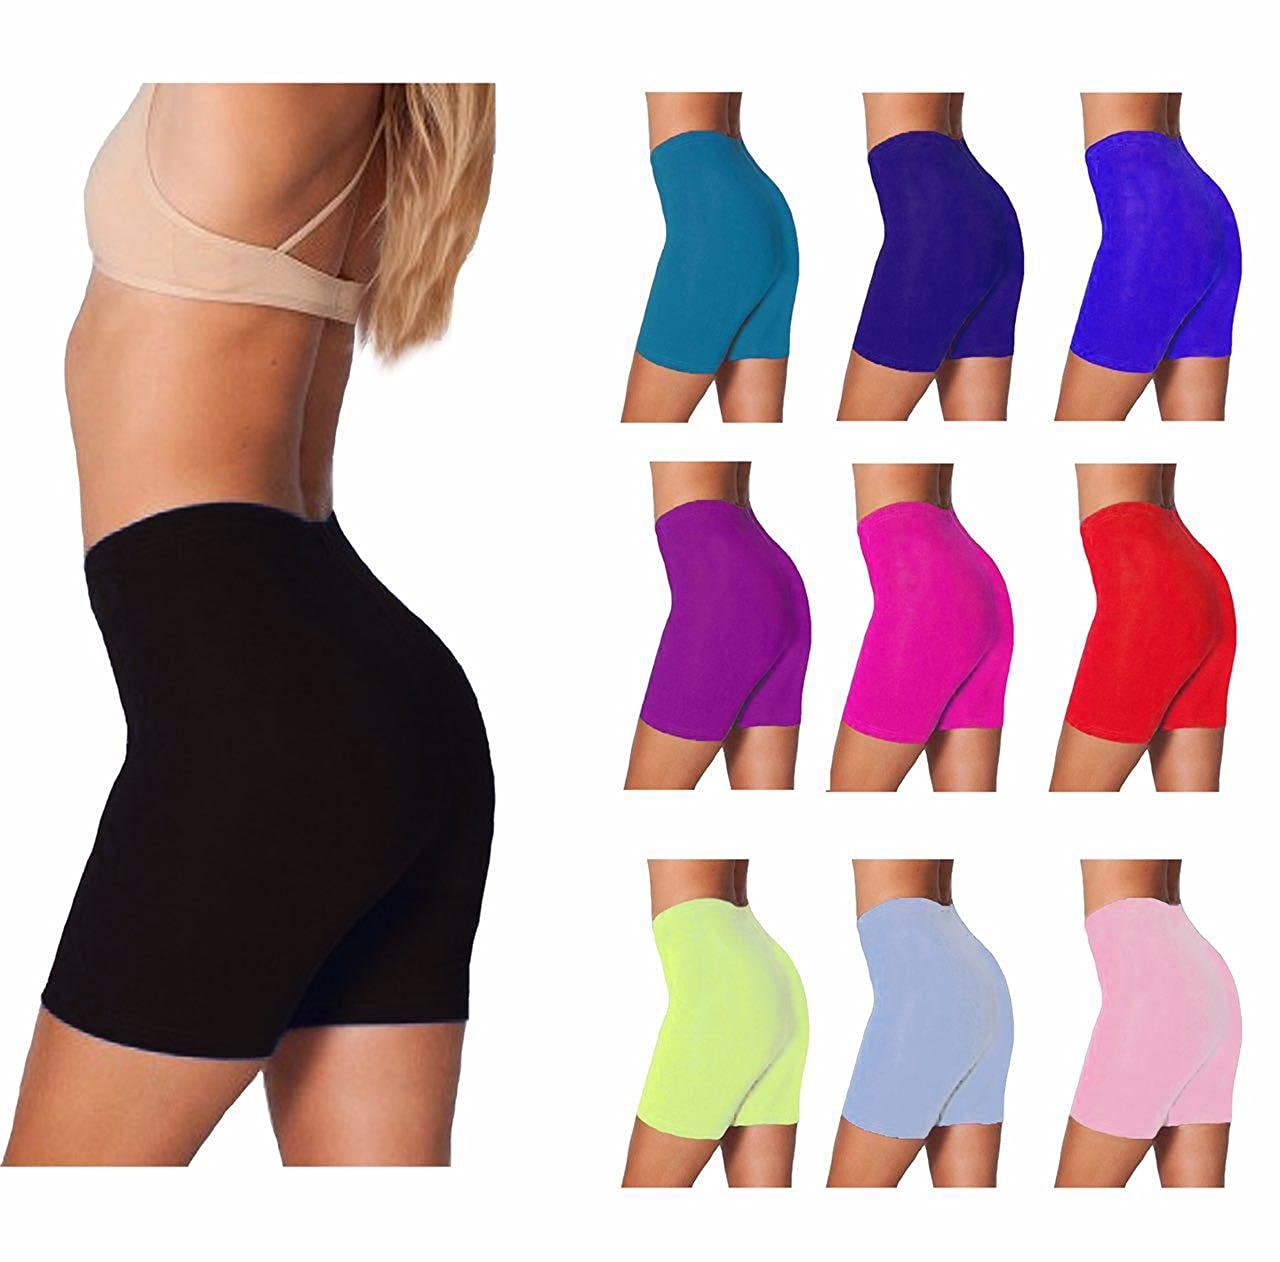 Womens Lycra Cotton Cycling Shorts Gym Shorts Above Knee Length Yoga Pants Running Leggings S-XXL